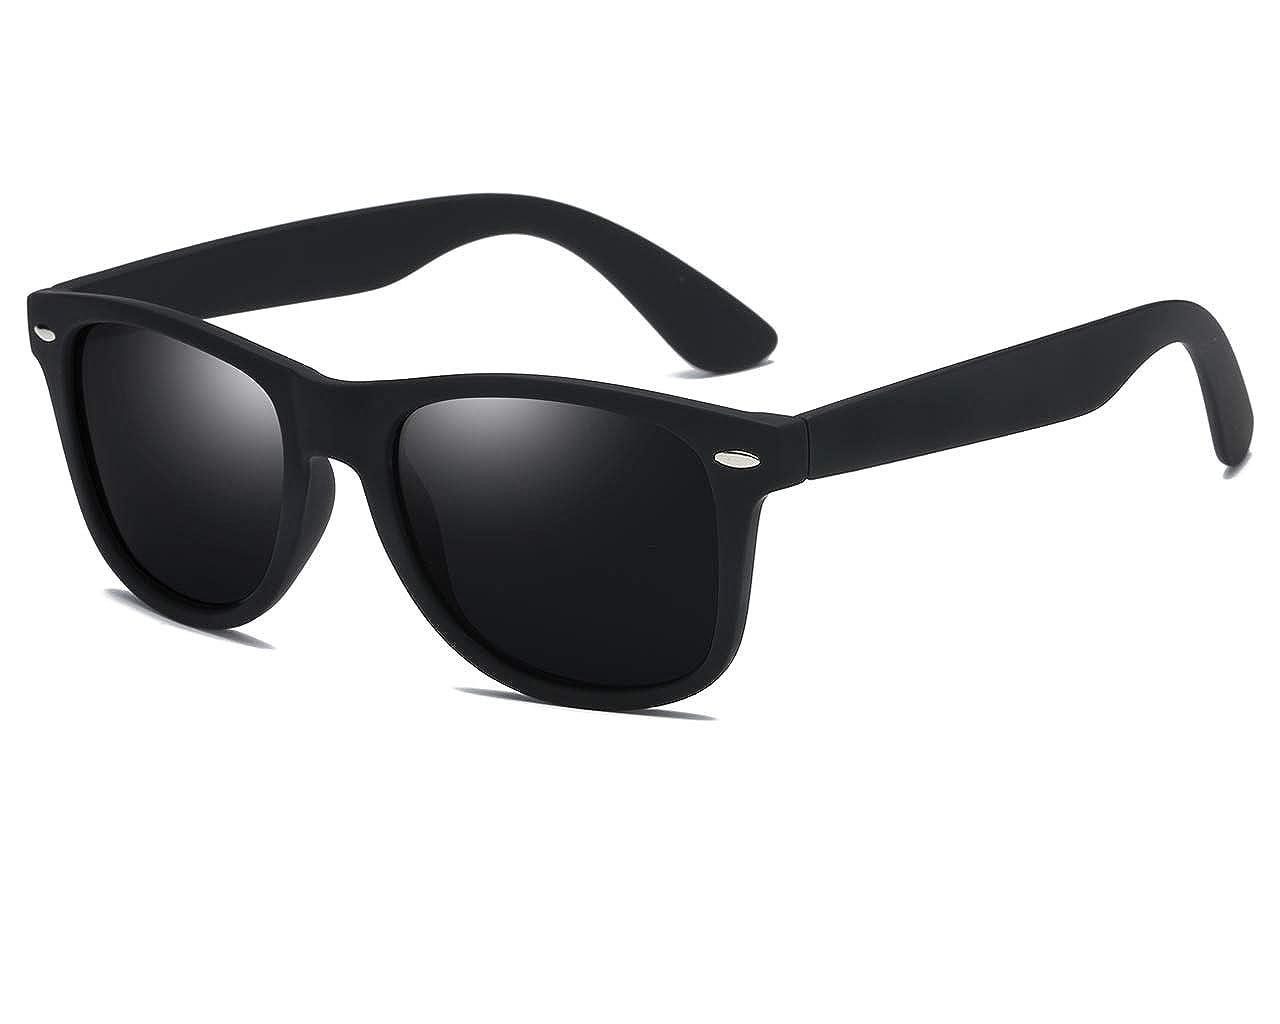 70a2d98eb38 Amazon.com  SIKYGEUM Polarized Sunglasses for Men Women Retro Wayfarer  Black HD Vision UV400  Clothing